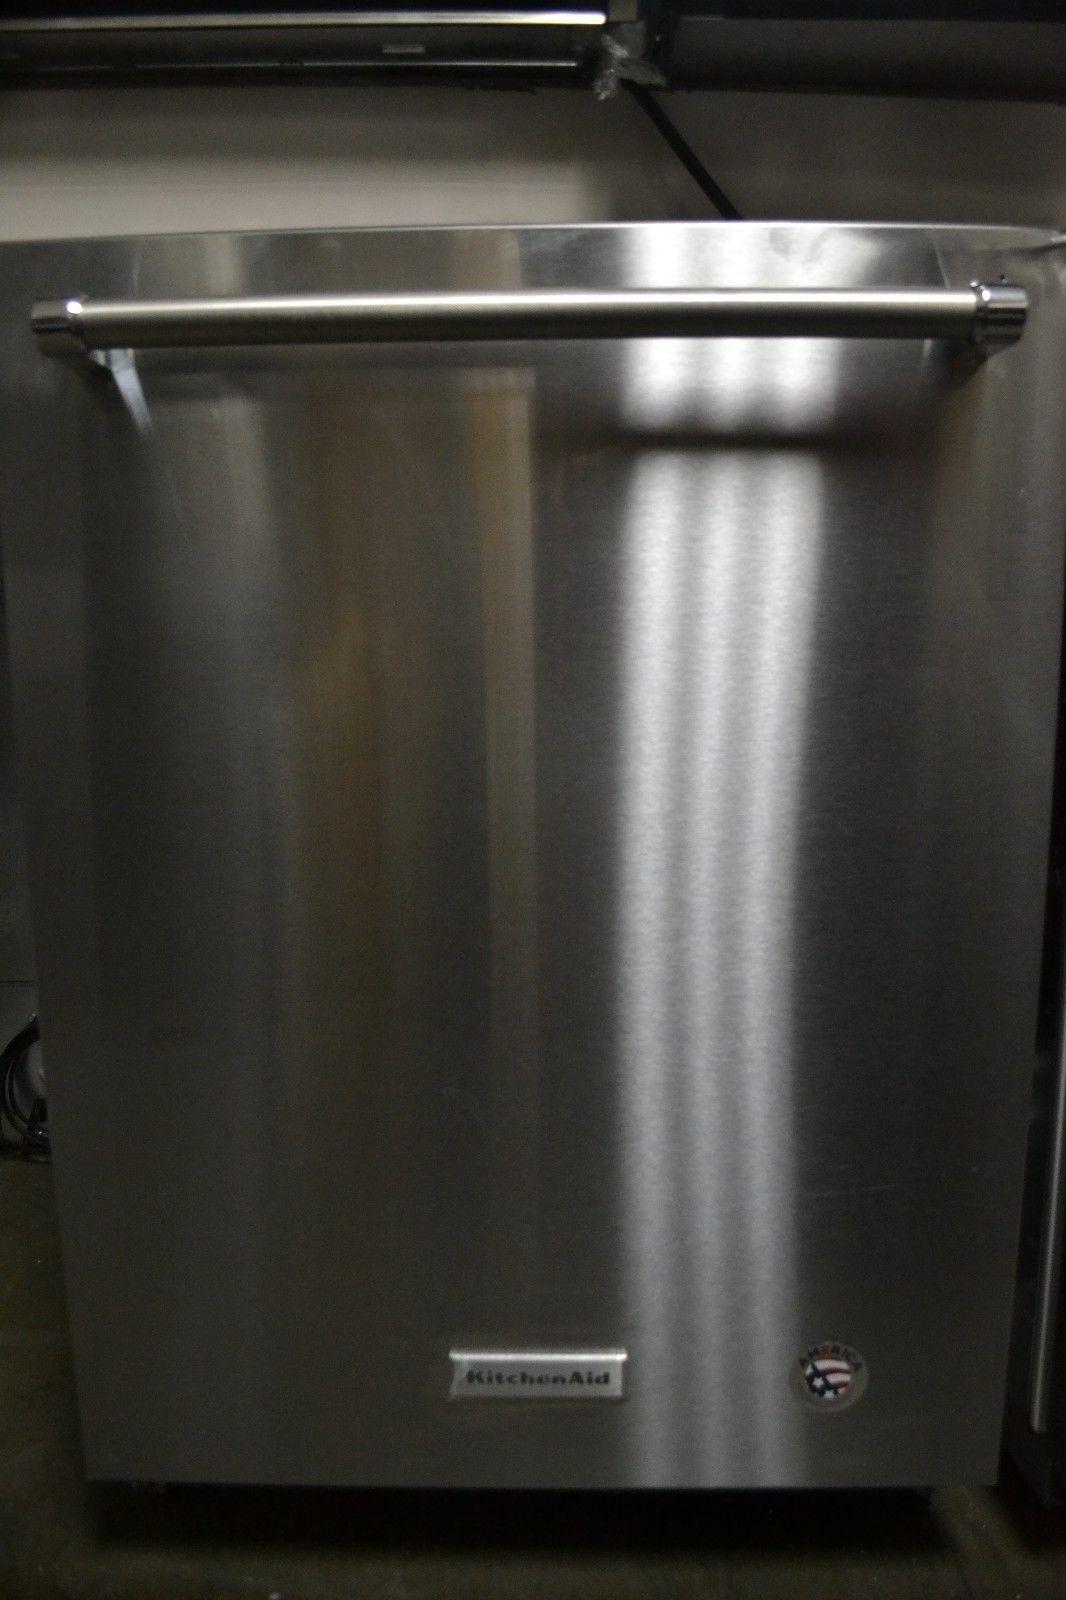 where are kitchenaid dishwashers built